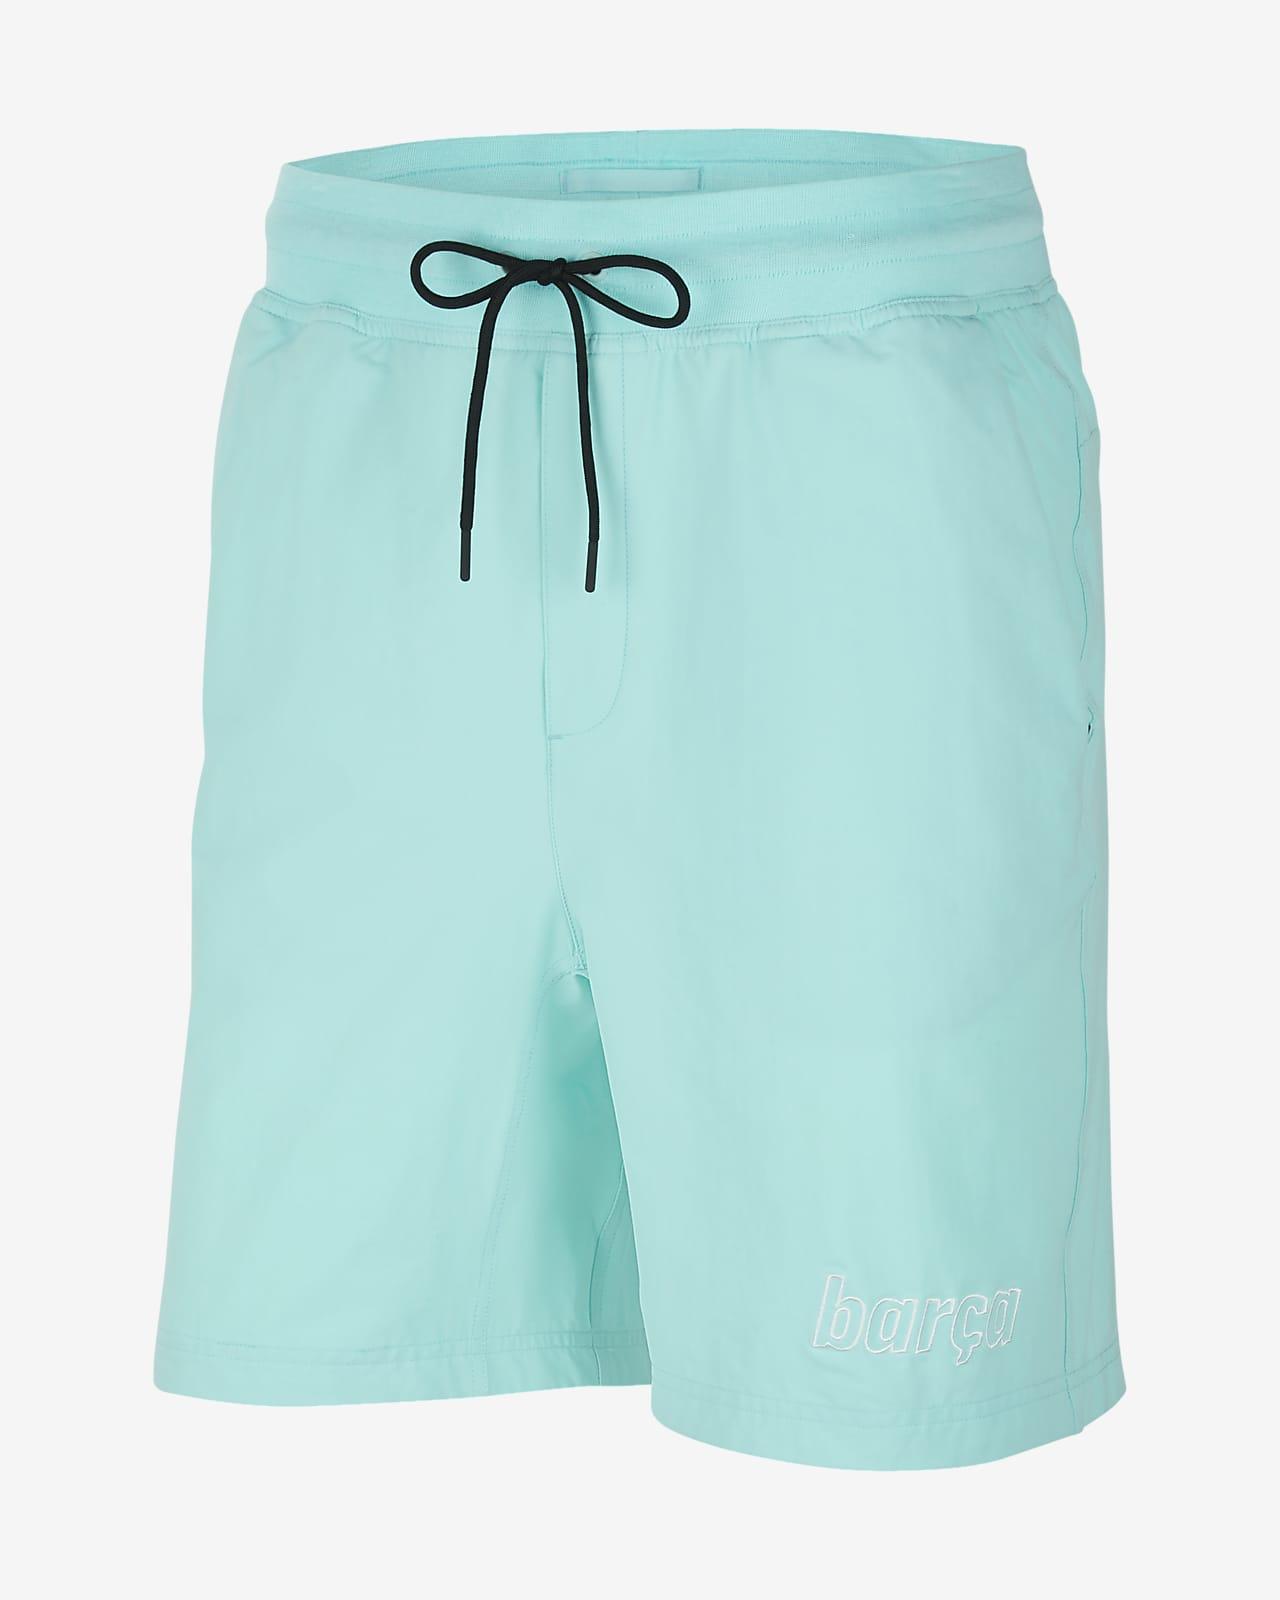 Nike Sportswear F.C. Barcelona Men's Woven Shorts